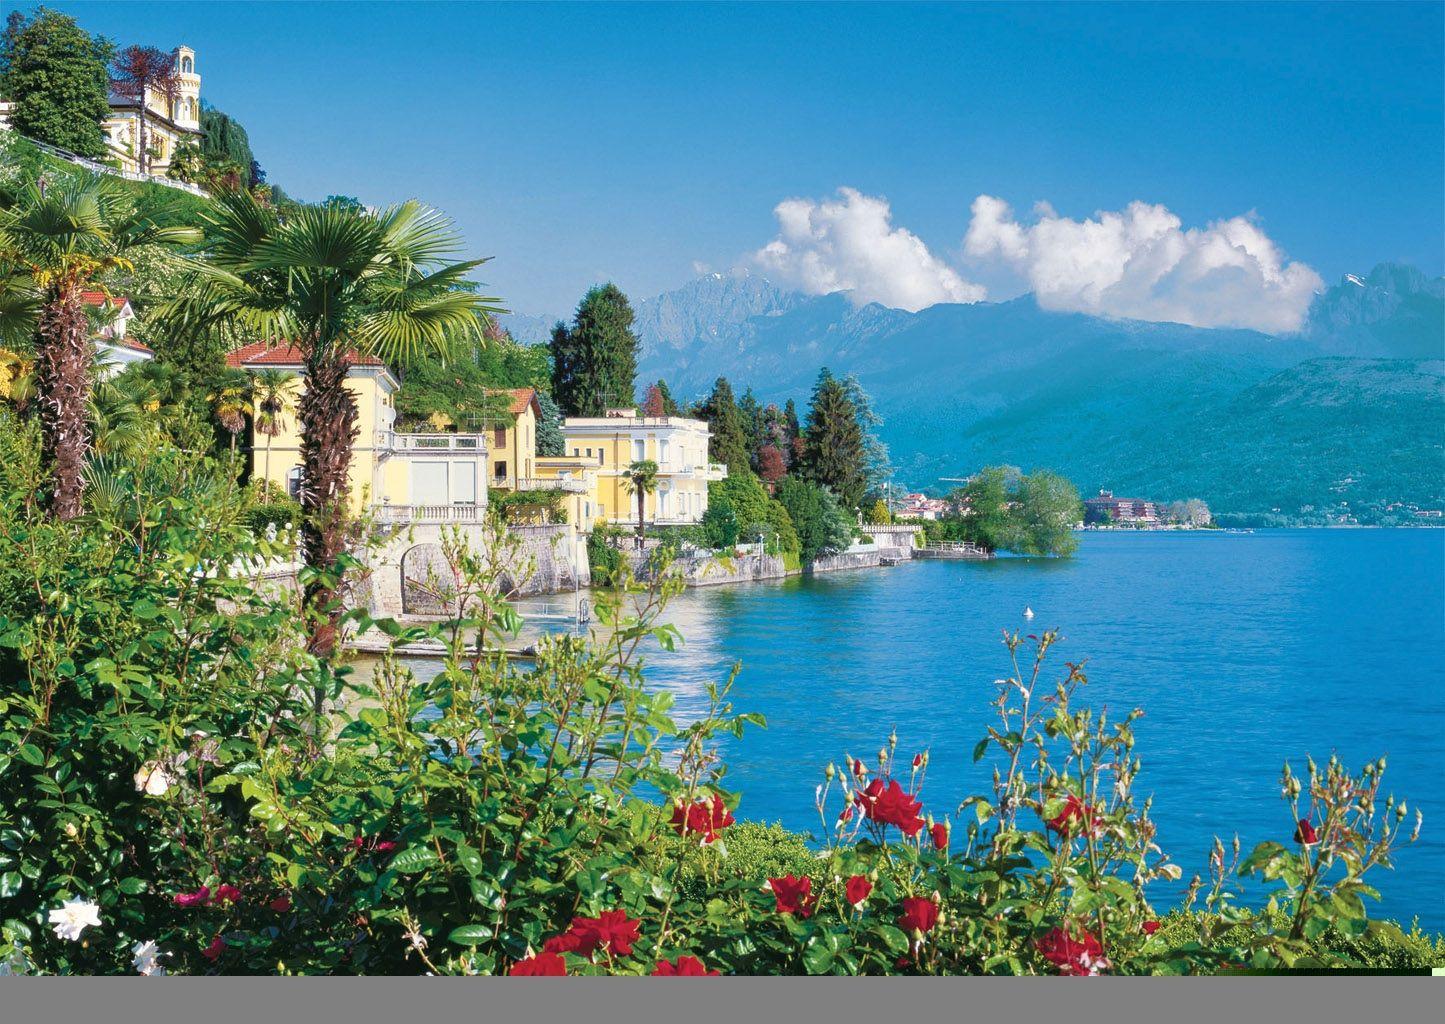 Lago Maggiore, Italy Lake Como & Lakes Region of Italy